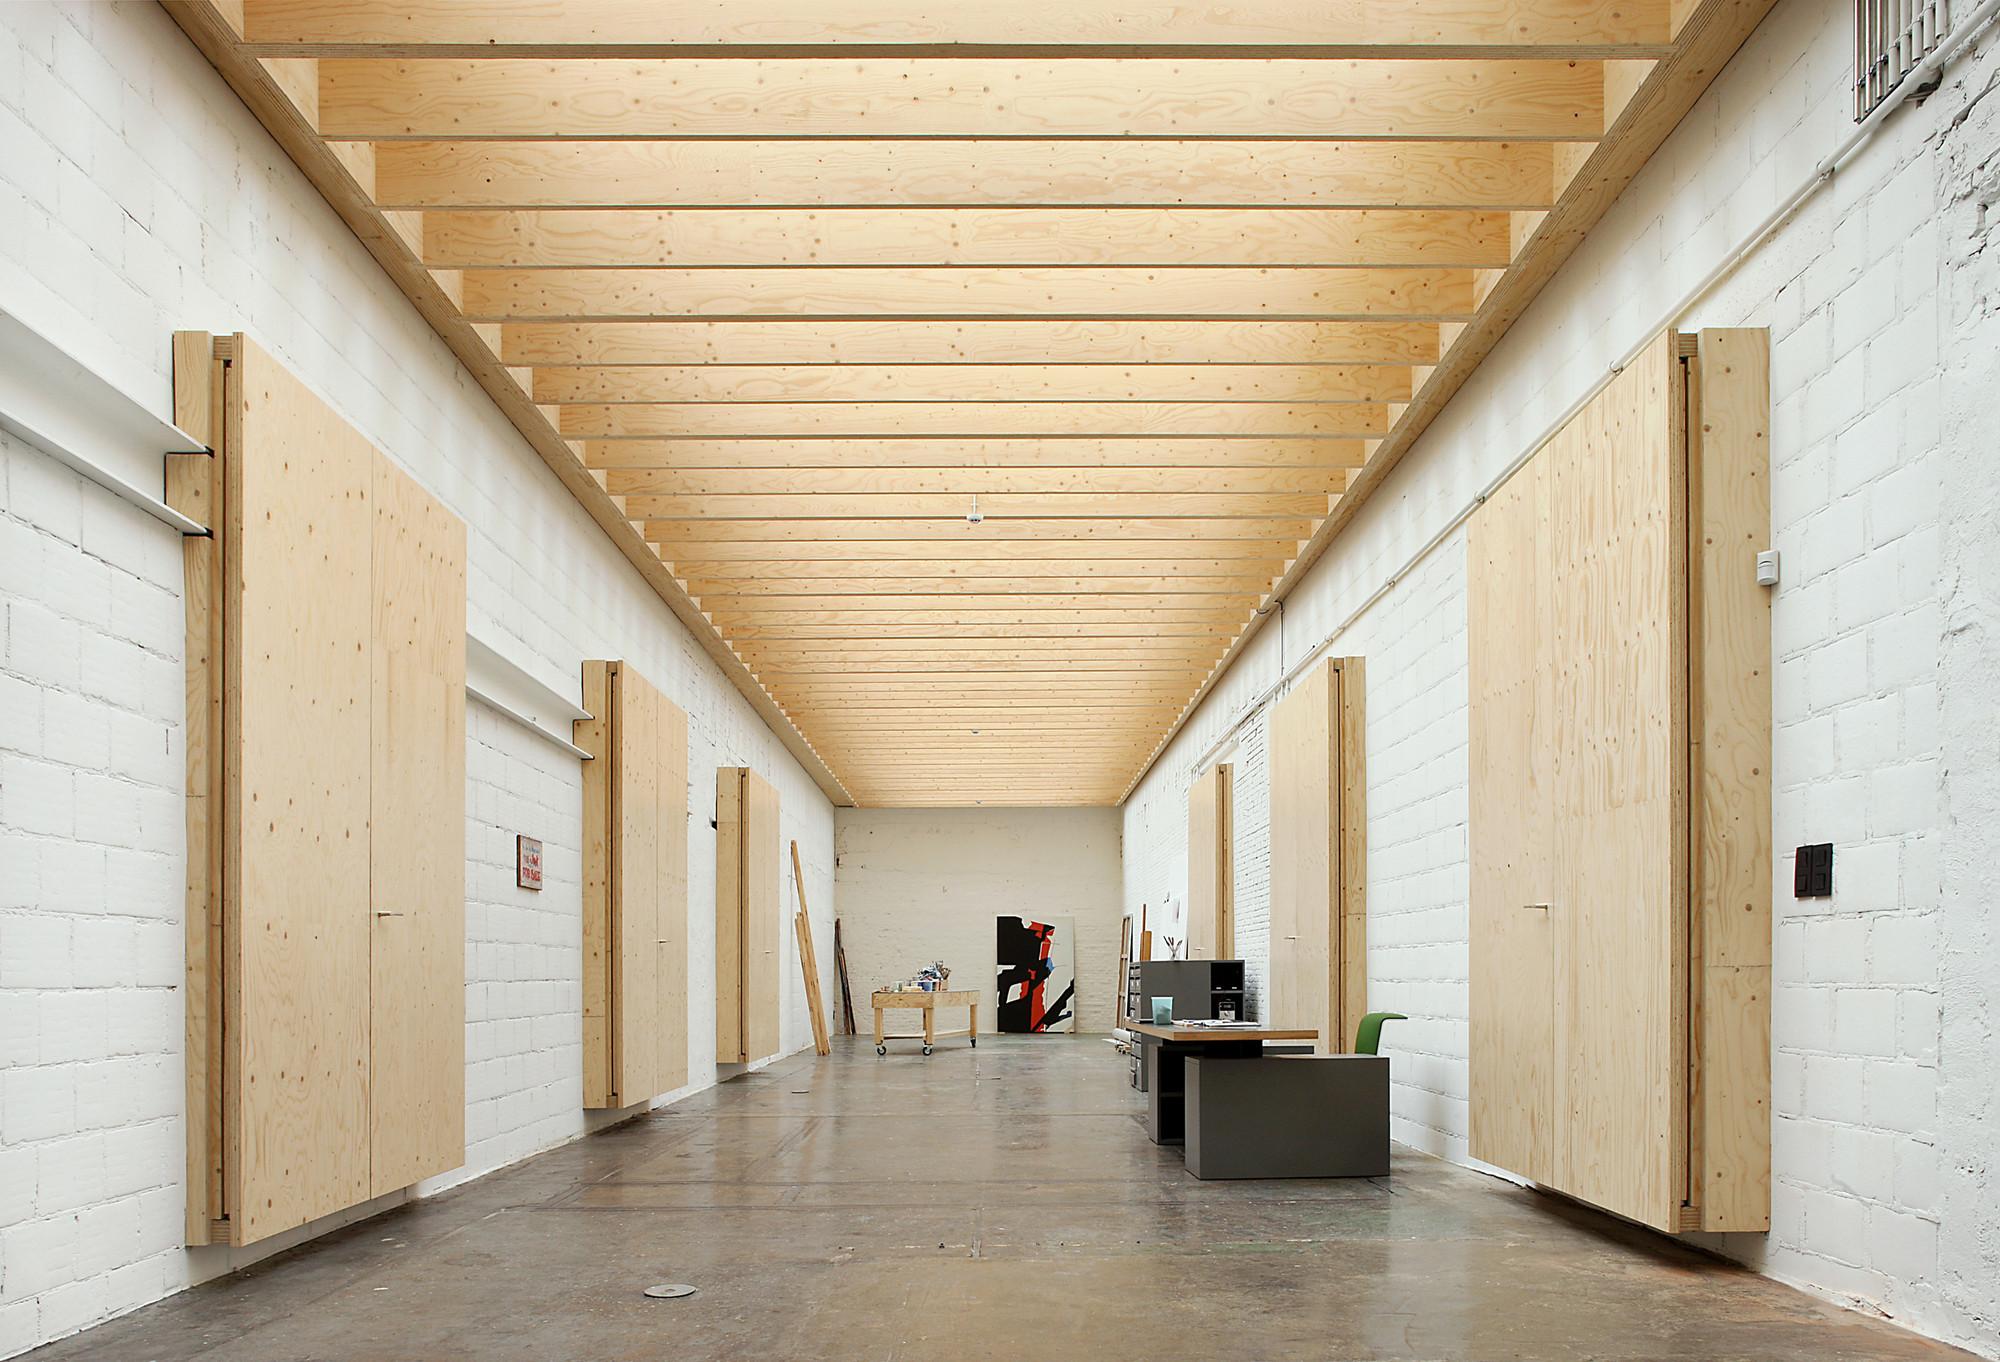 Studio Koen van den Broek / Tijl Vanmeirhaeghe, Carl Bourgeois, © Filip Dujardin